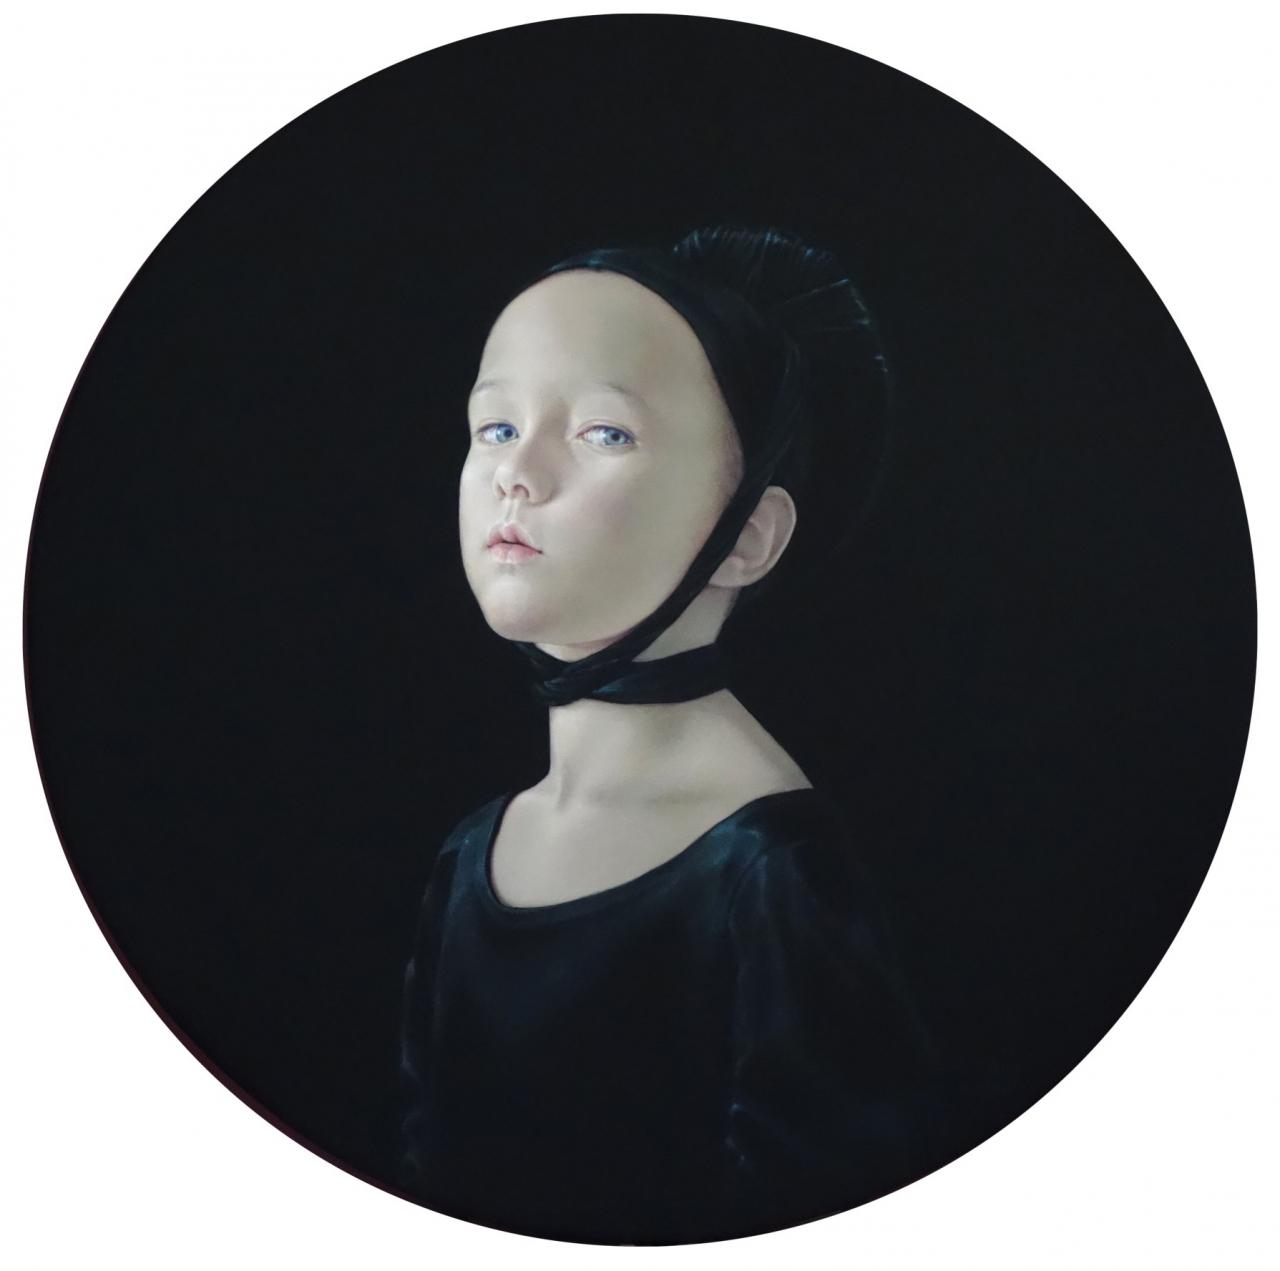 o.T. (black painting) 2015